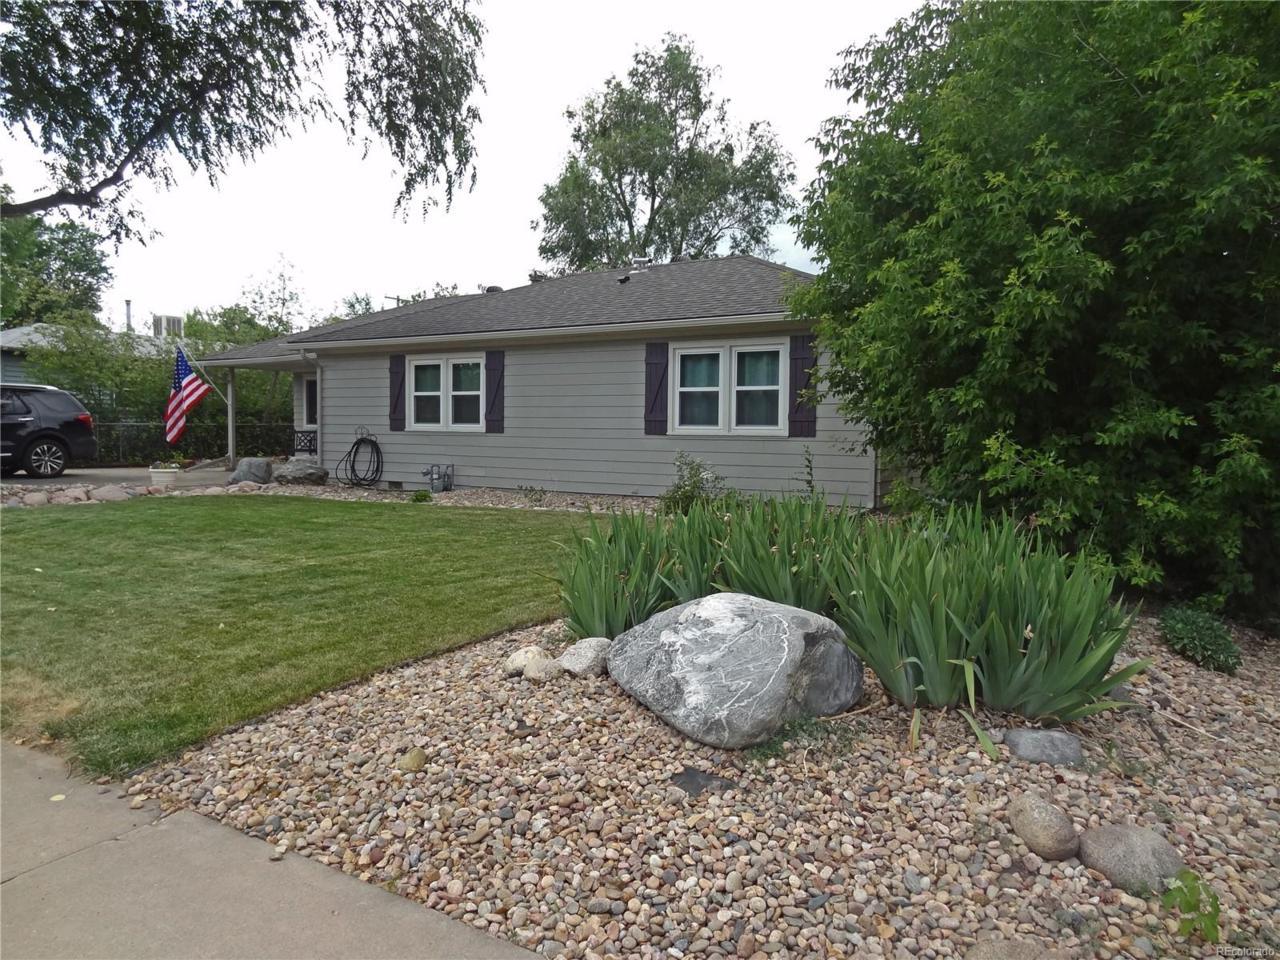 6419 S Windermere Street, Littleton, CO 80120 (MLS #5988360) :: 8z Real Estate